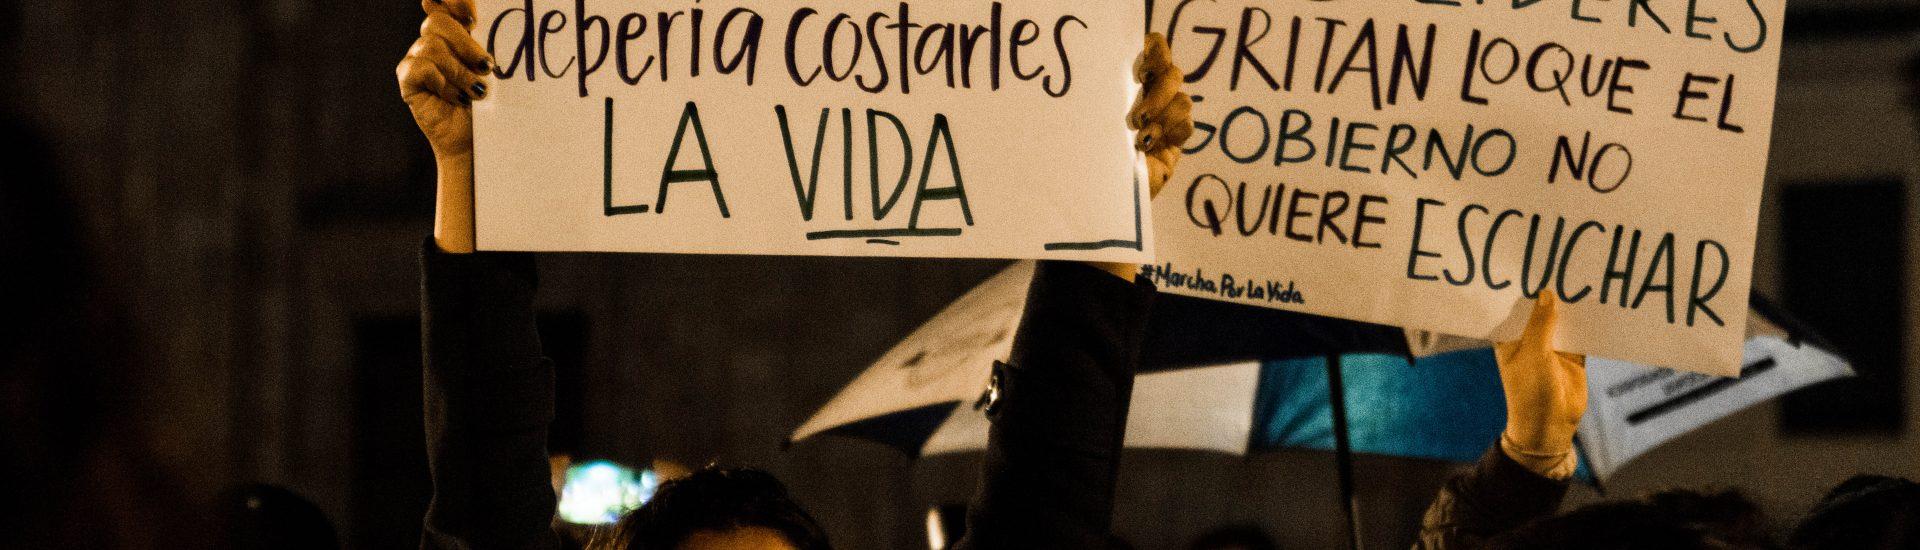 Asesinan en El Carmen al líder social Jean Carlos Rodríguez Díaz